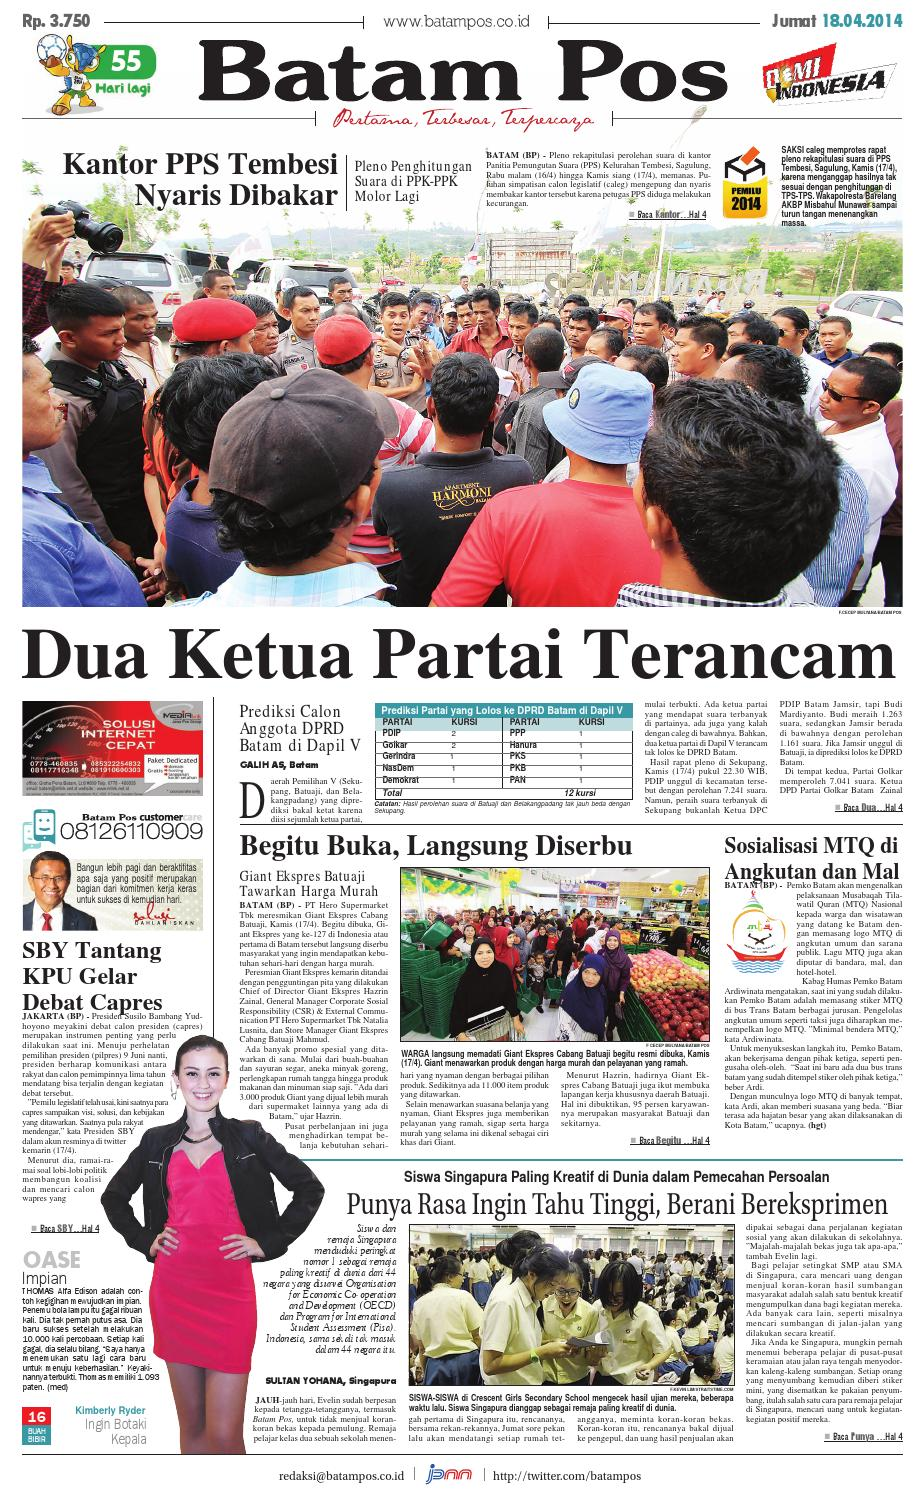 18 April 2014 By Batampos Newspaper Issuu Rejeki Anak Soleh 3 Voucher Carrefour Rp 200000